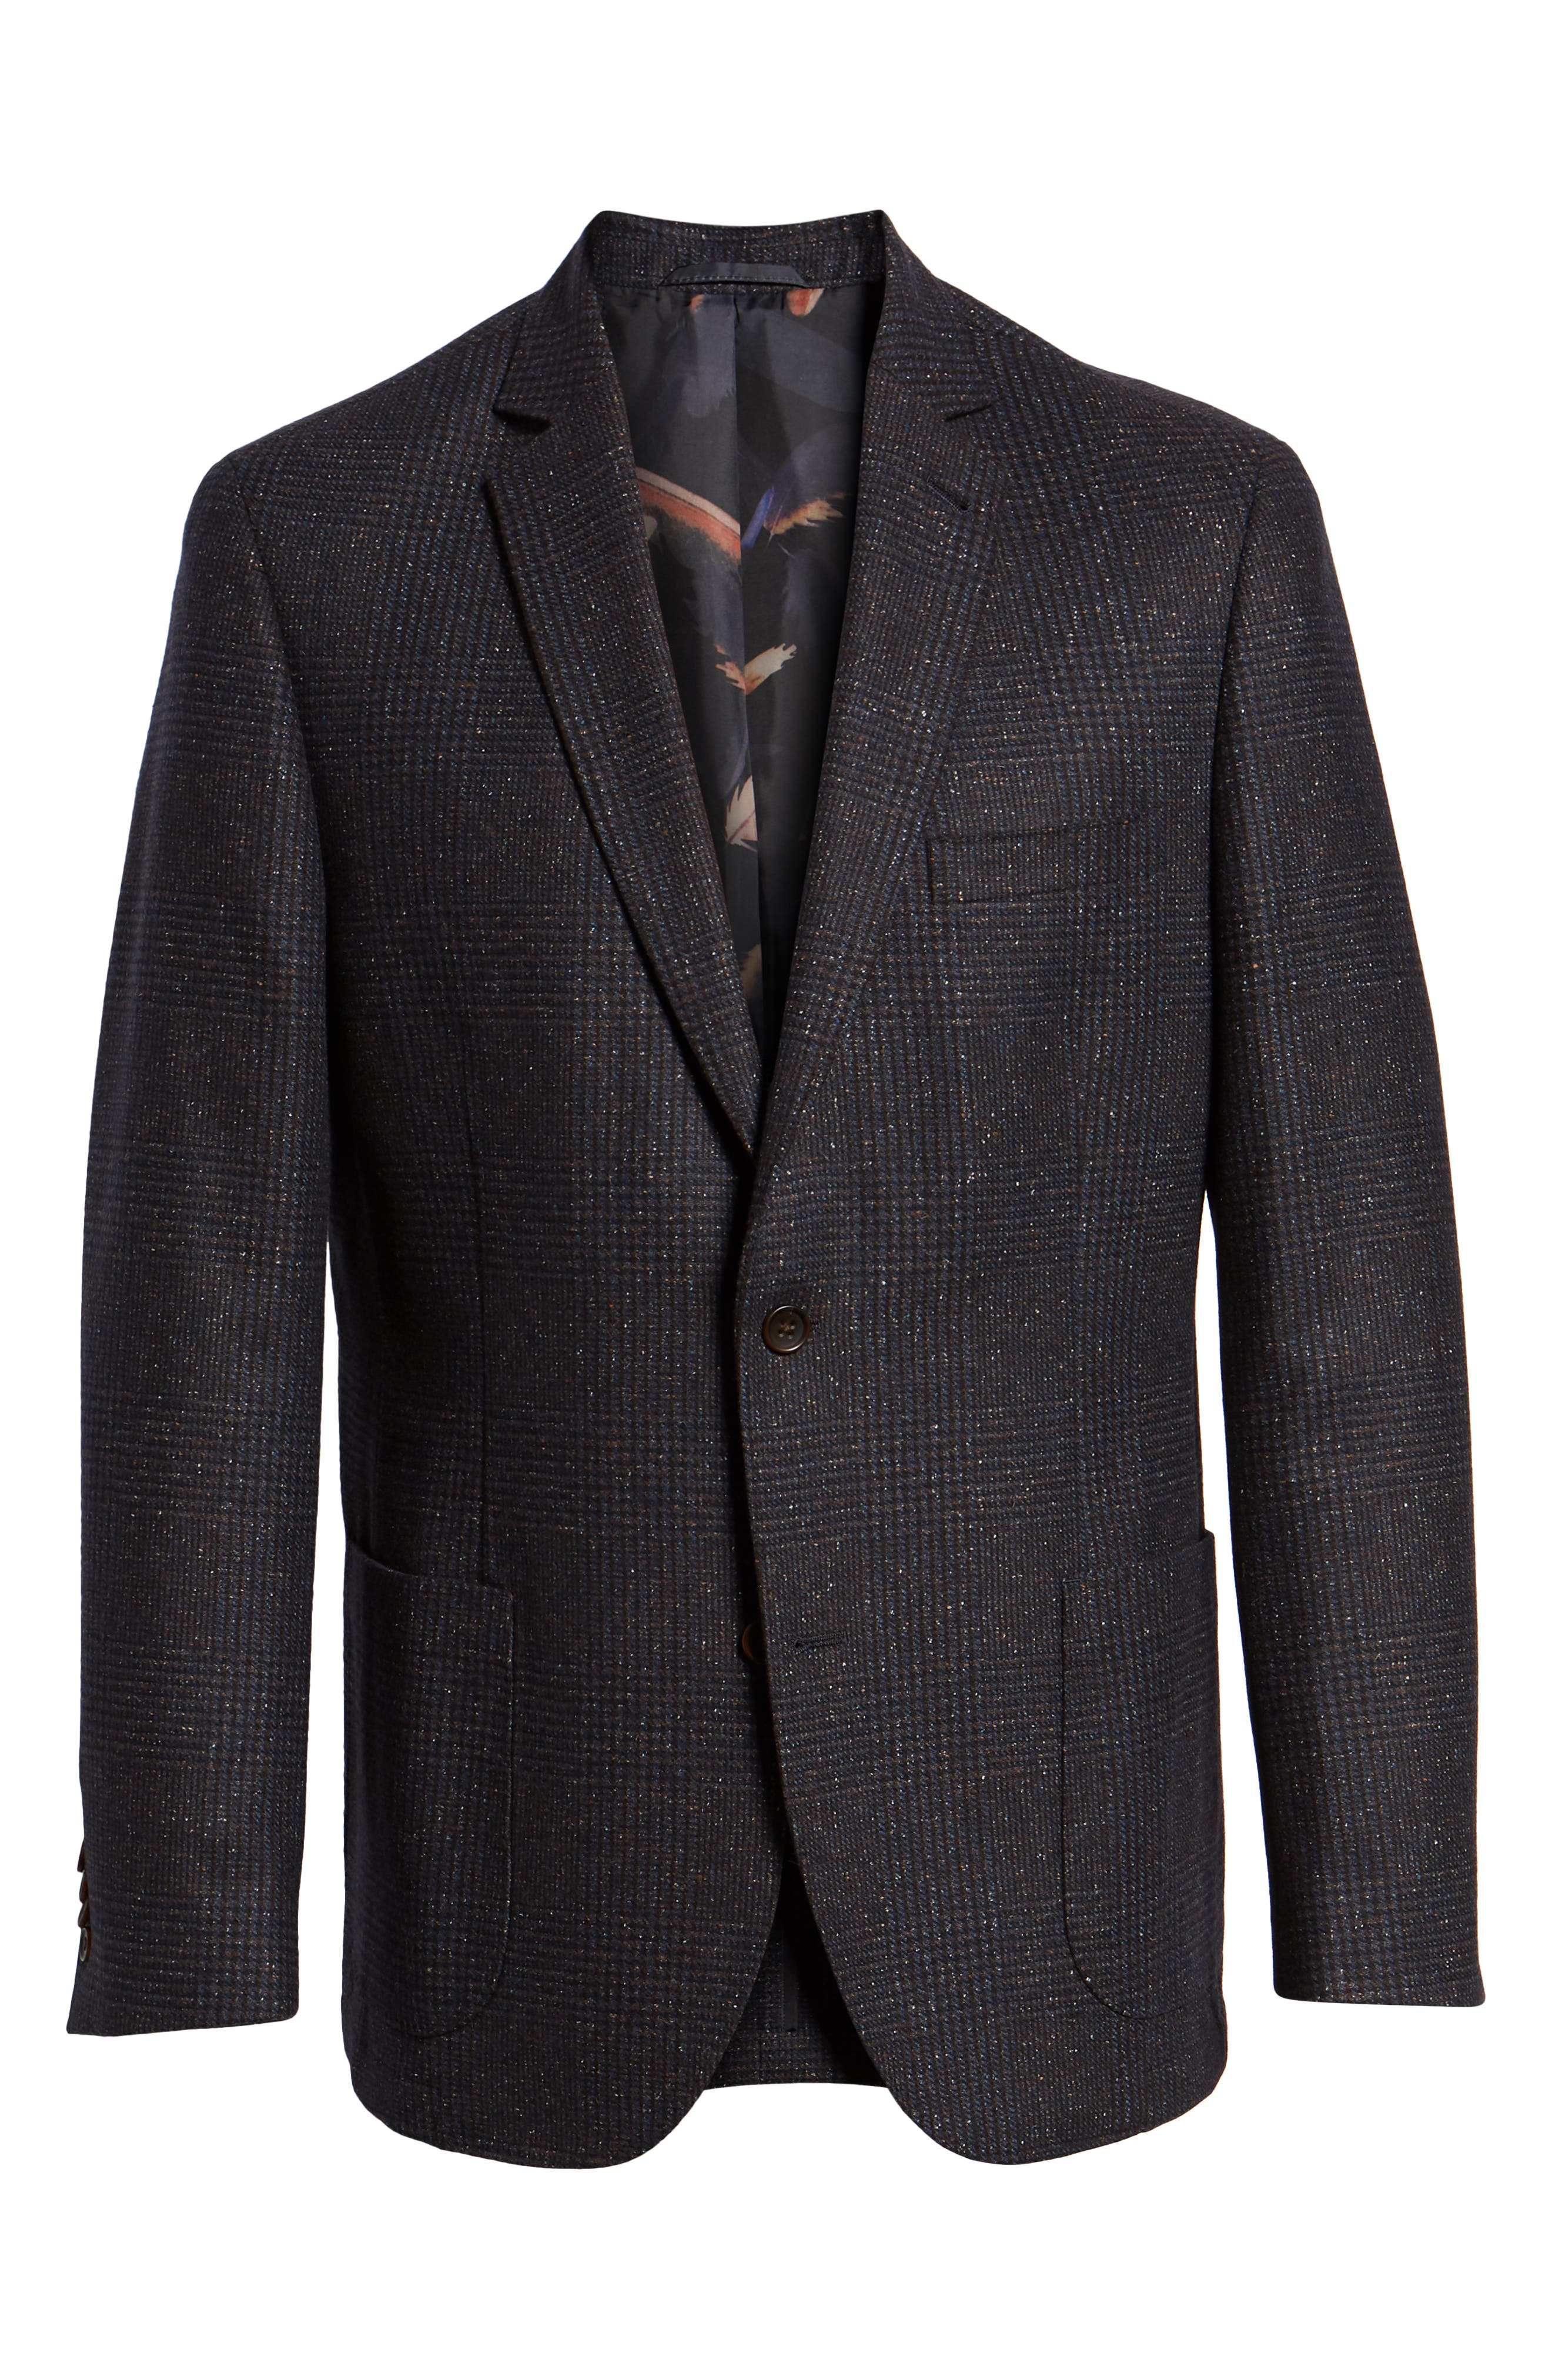 Regular Fit Wool & Silk Blend Blazer,                             Alternate thumbnail 5, color,                             BROWN